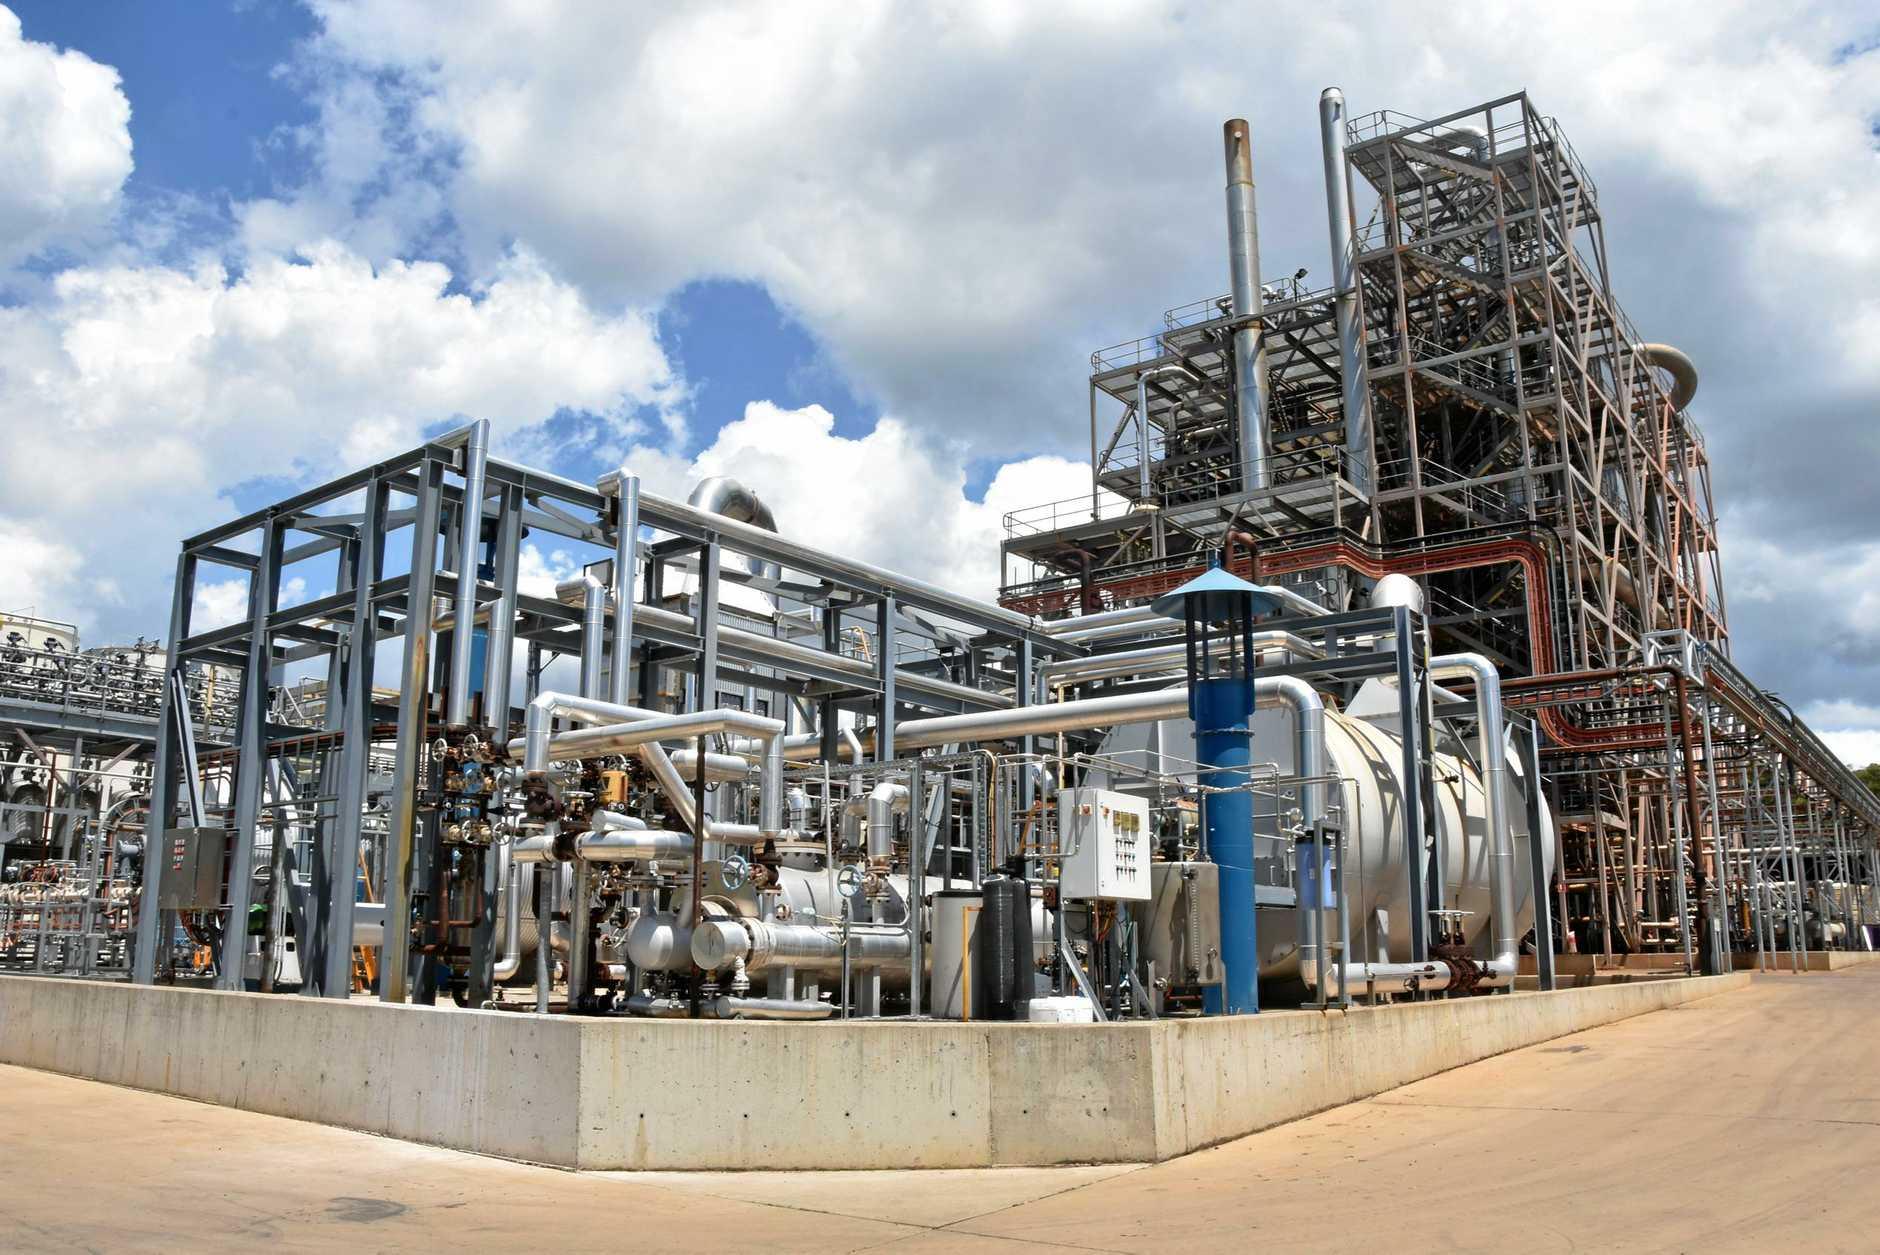 Northern Oil Refinery at Yarwun.